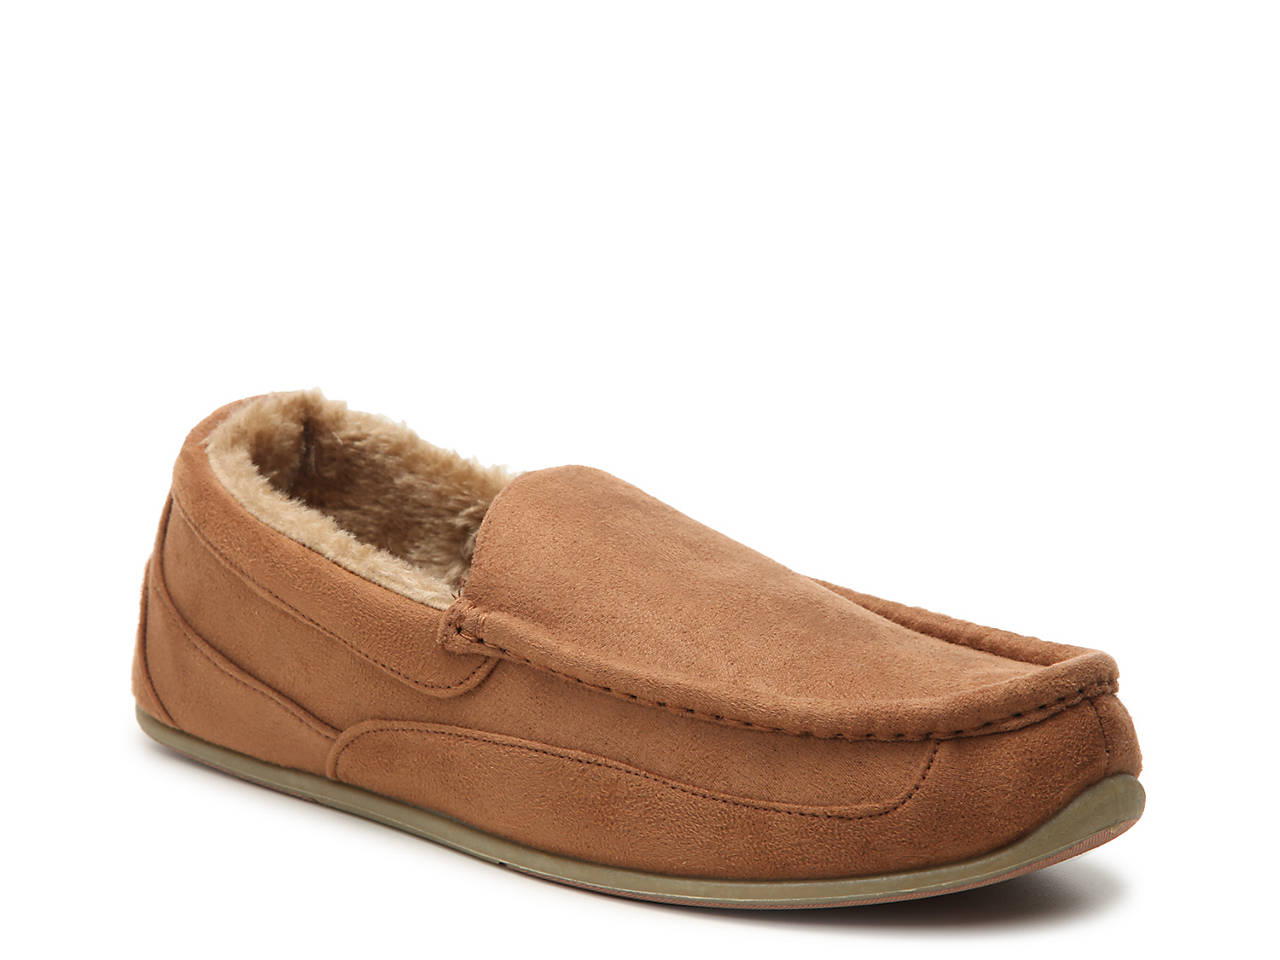 a5386a6c954c6 Deer Stags Slipperooz Spun Moc Slipper Men s Shoes